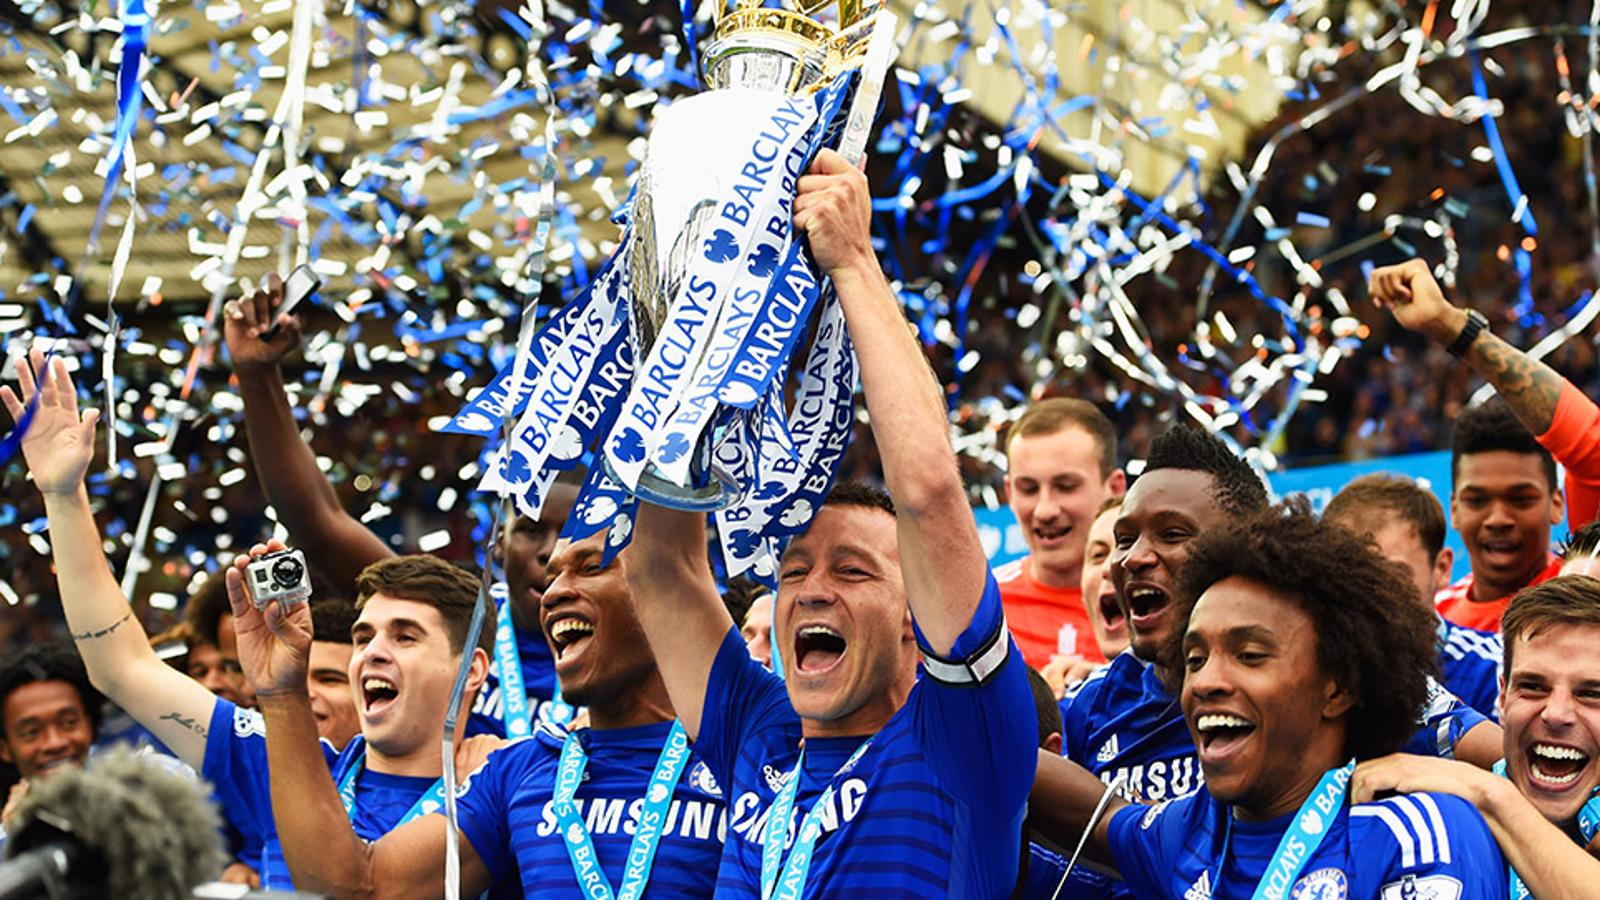 2014/15 Premier League Years